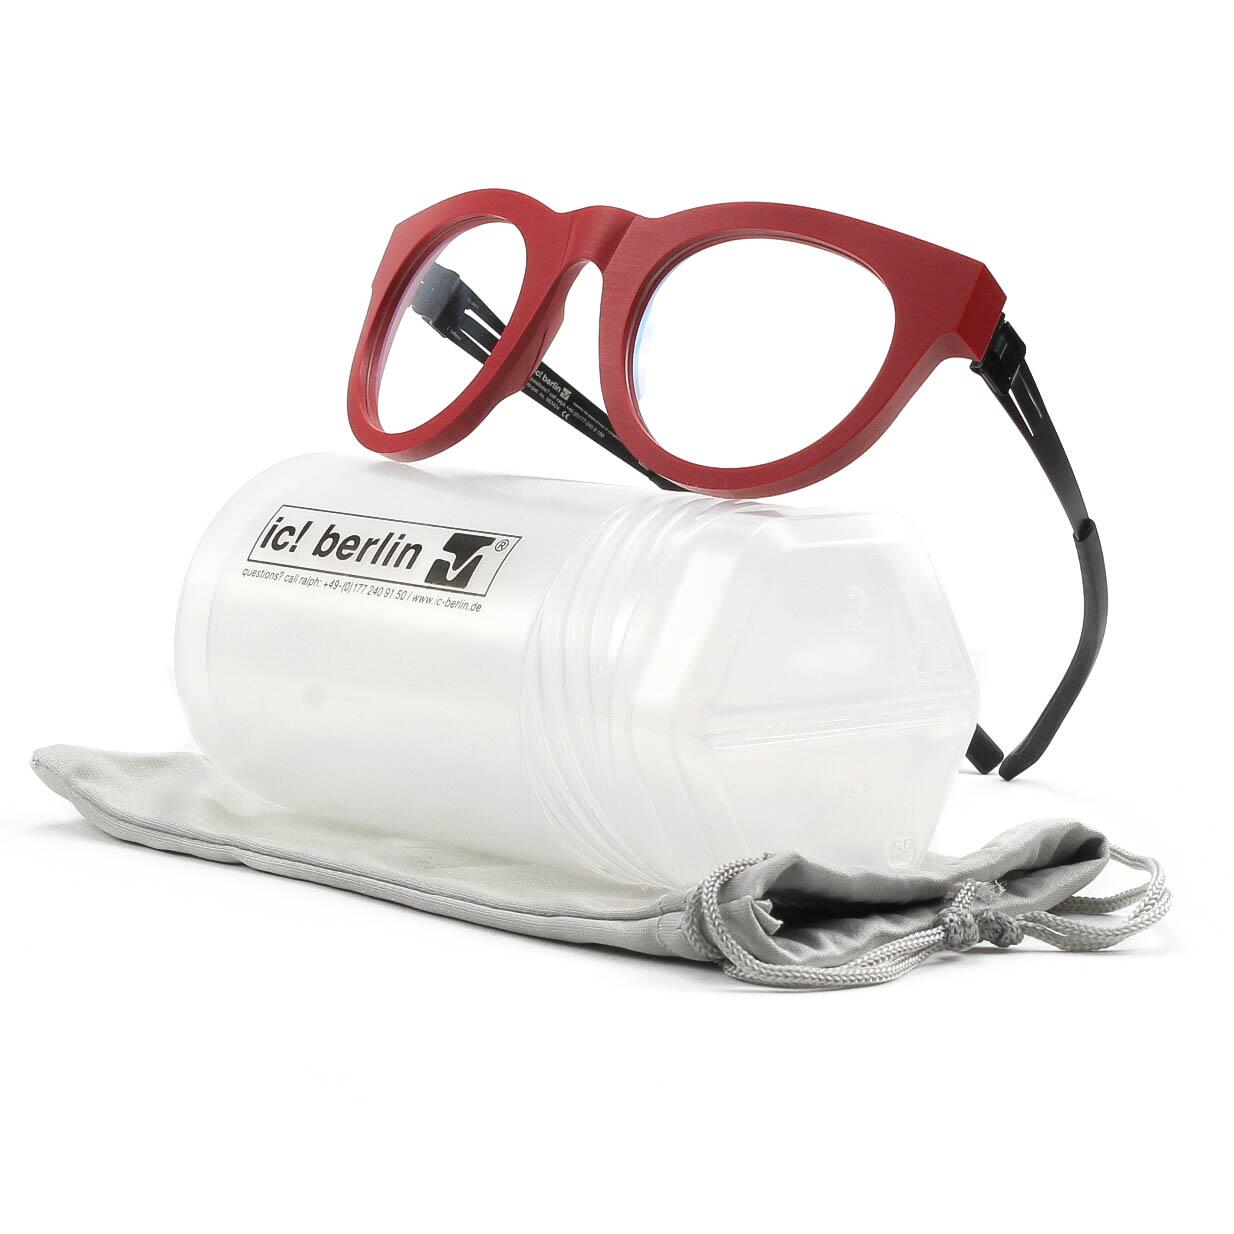 Just frames for glasses - Main Image